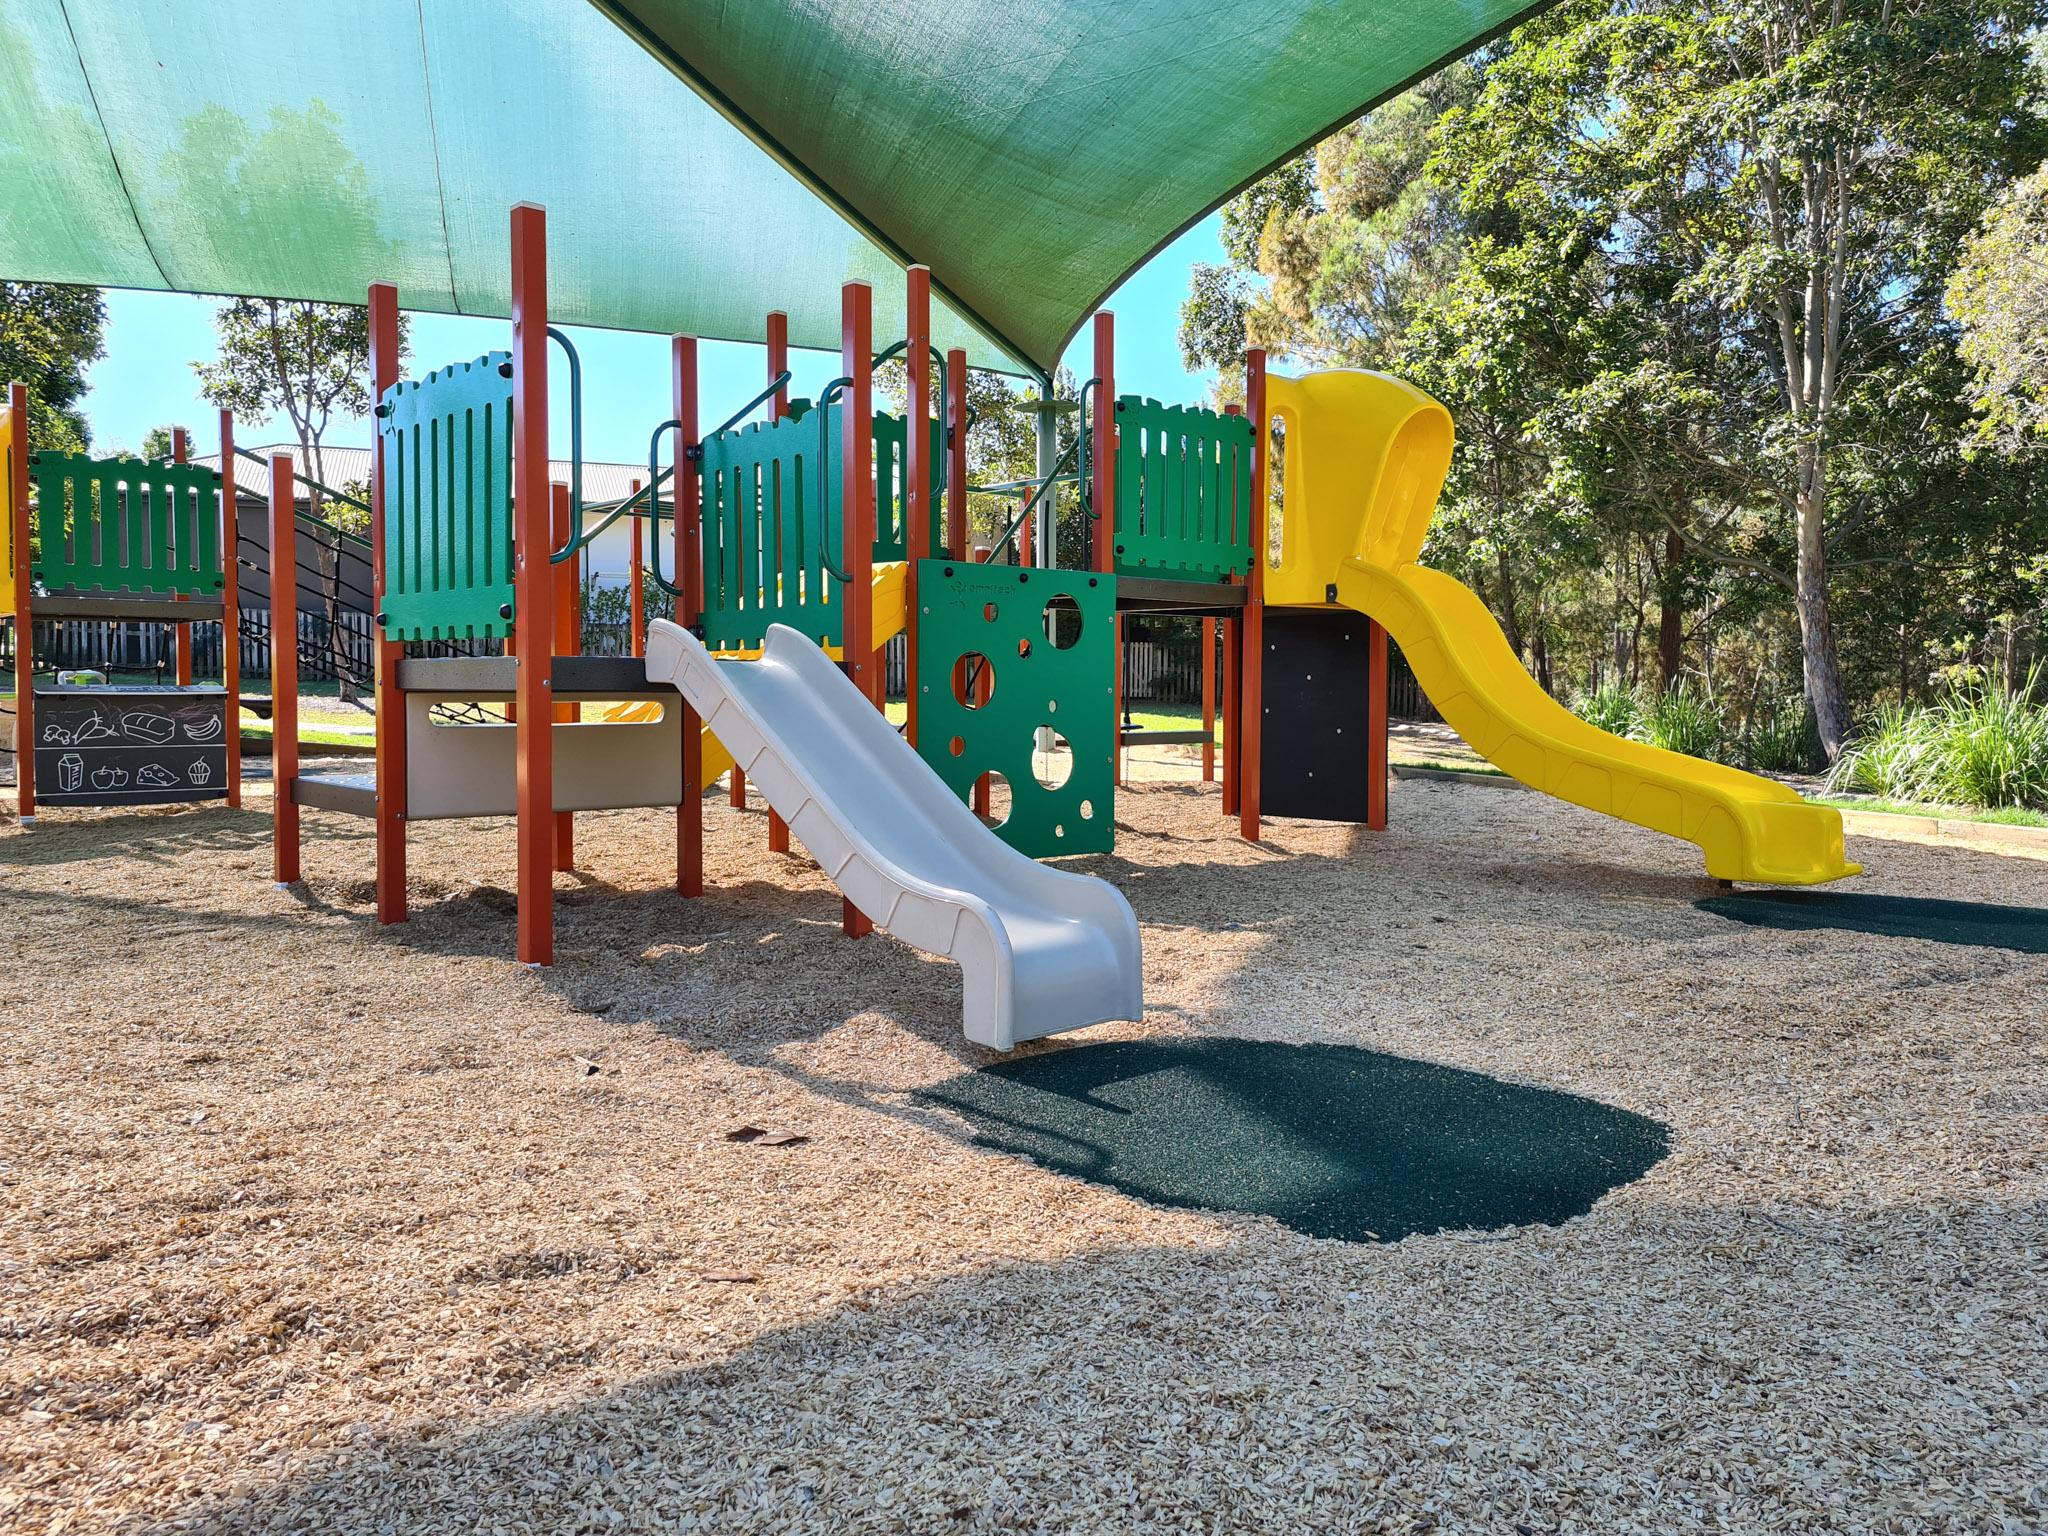 palm-beach-state-school-playrground-austek-play-63